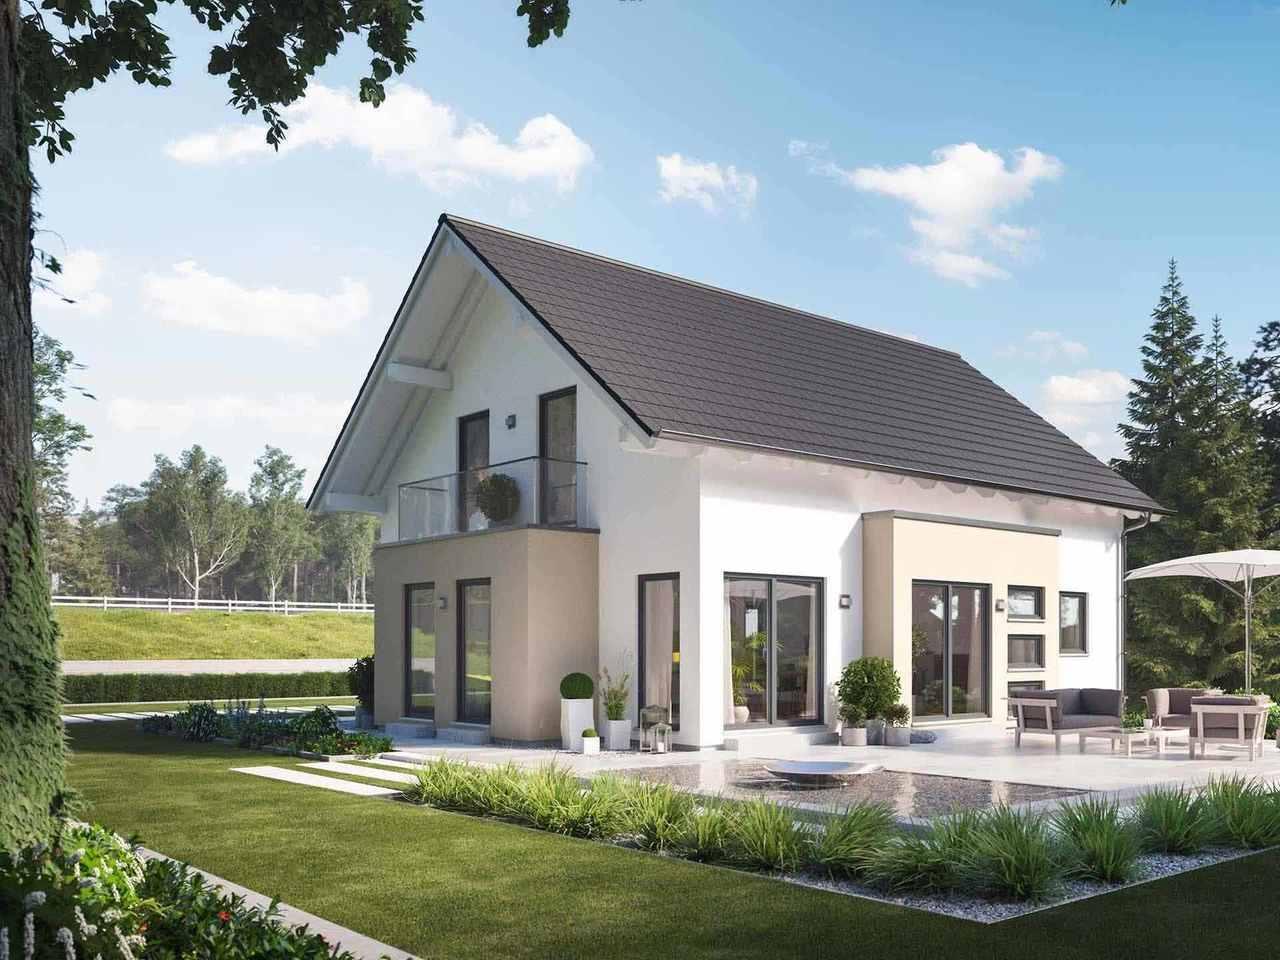 Einfamilienhaus Solitaire-E-165 E2 - Schwabenhaus